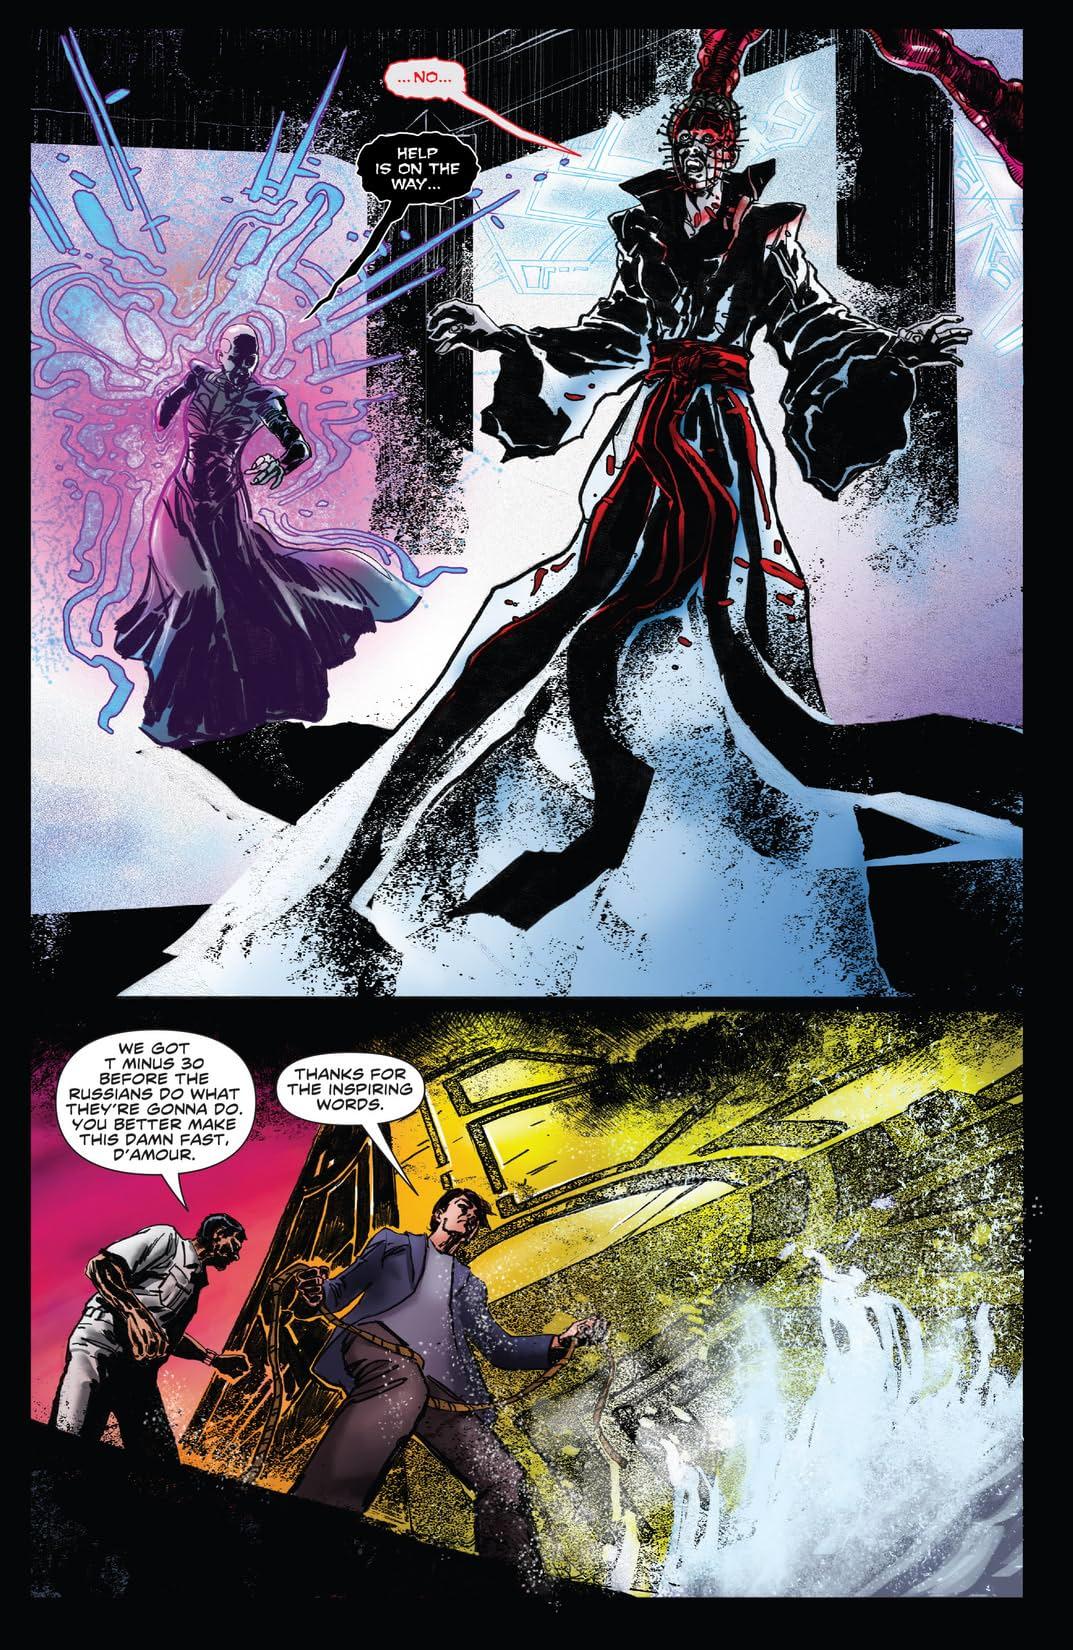 Hellraiser #19